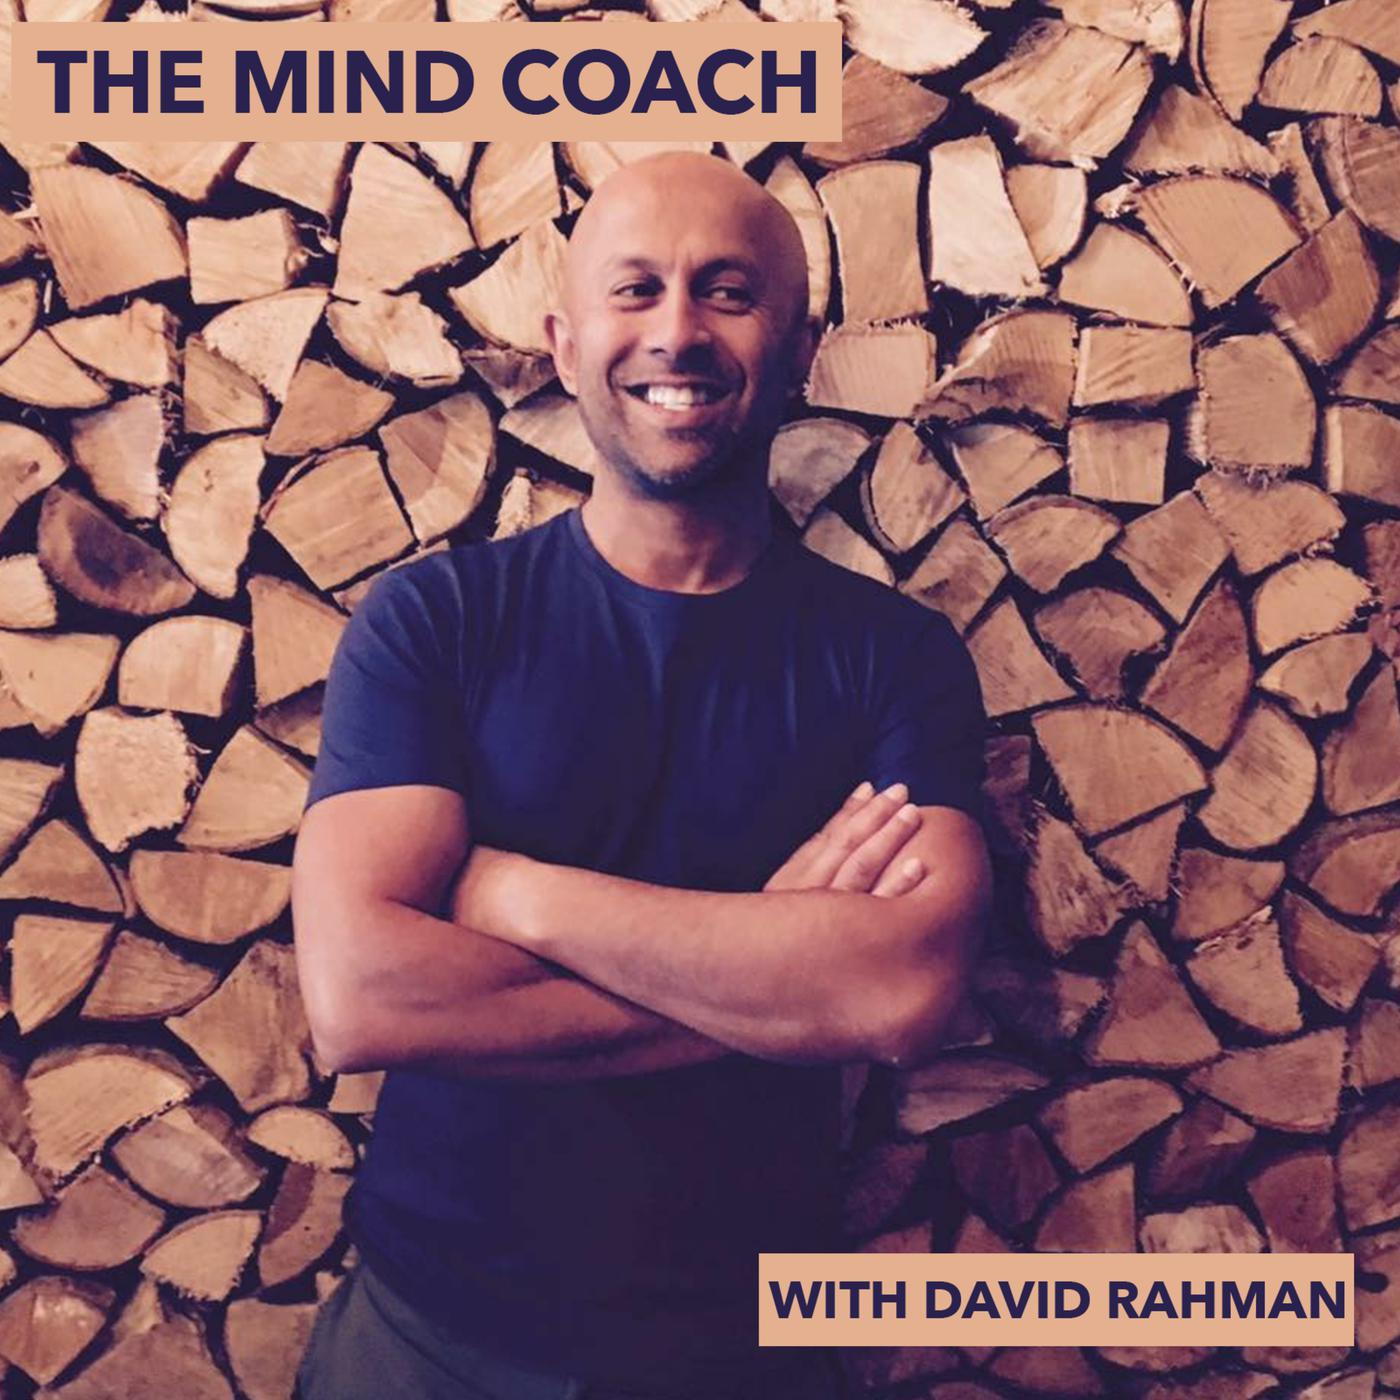 The Mind Coach (podcast) - David Rahman | Listen Notes